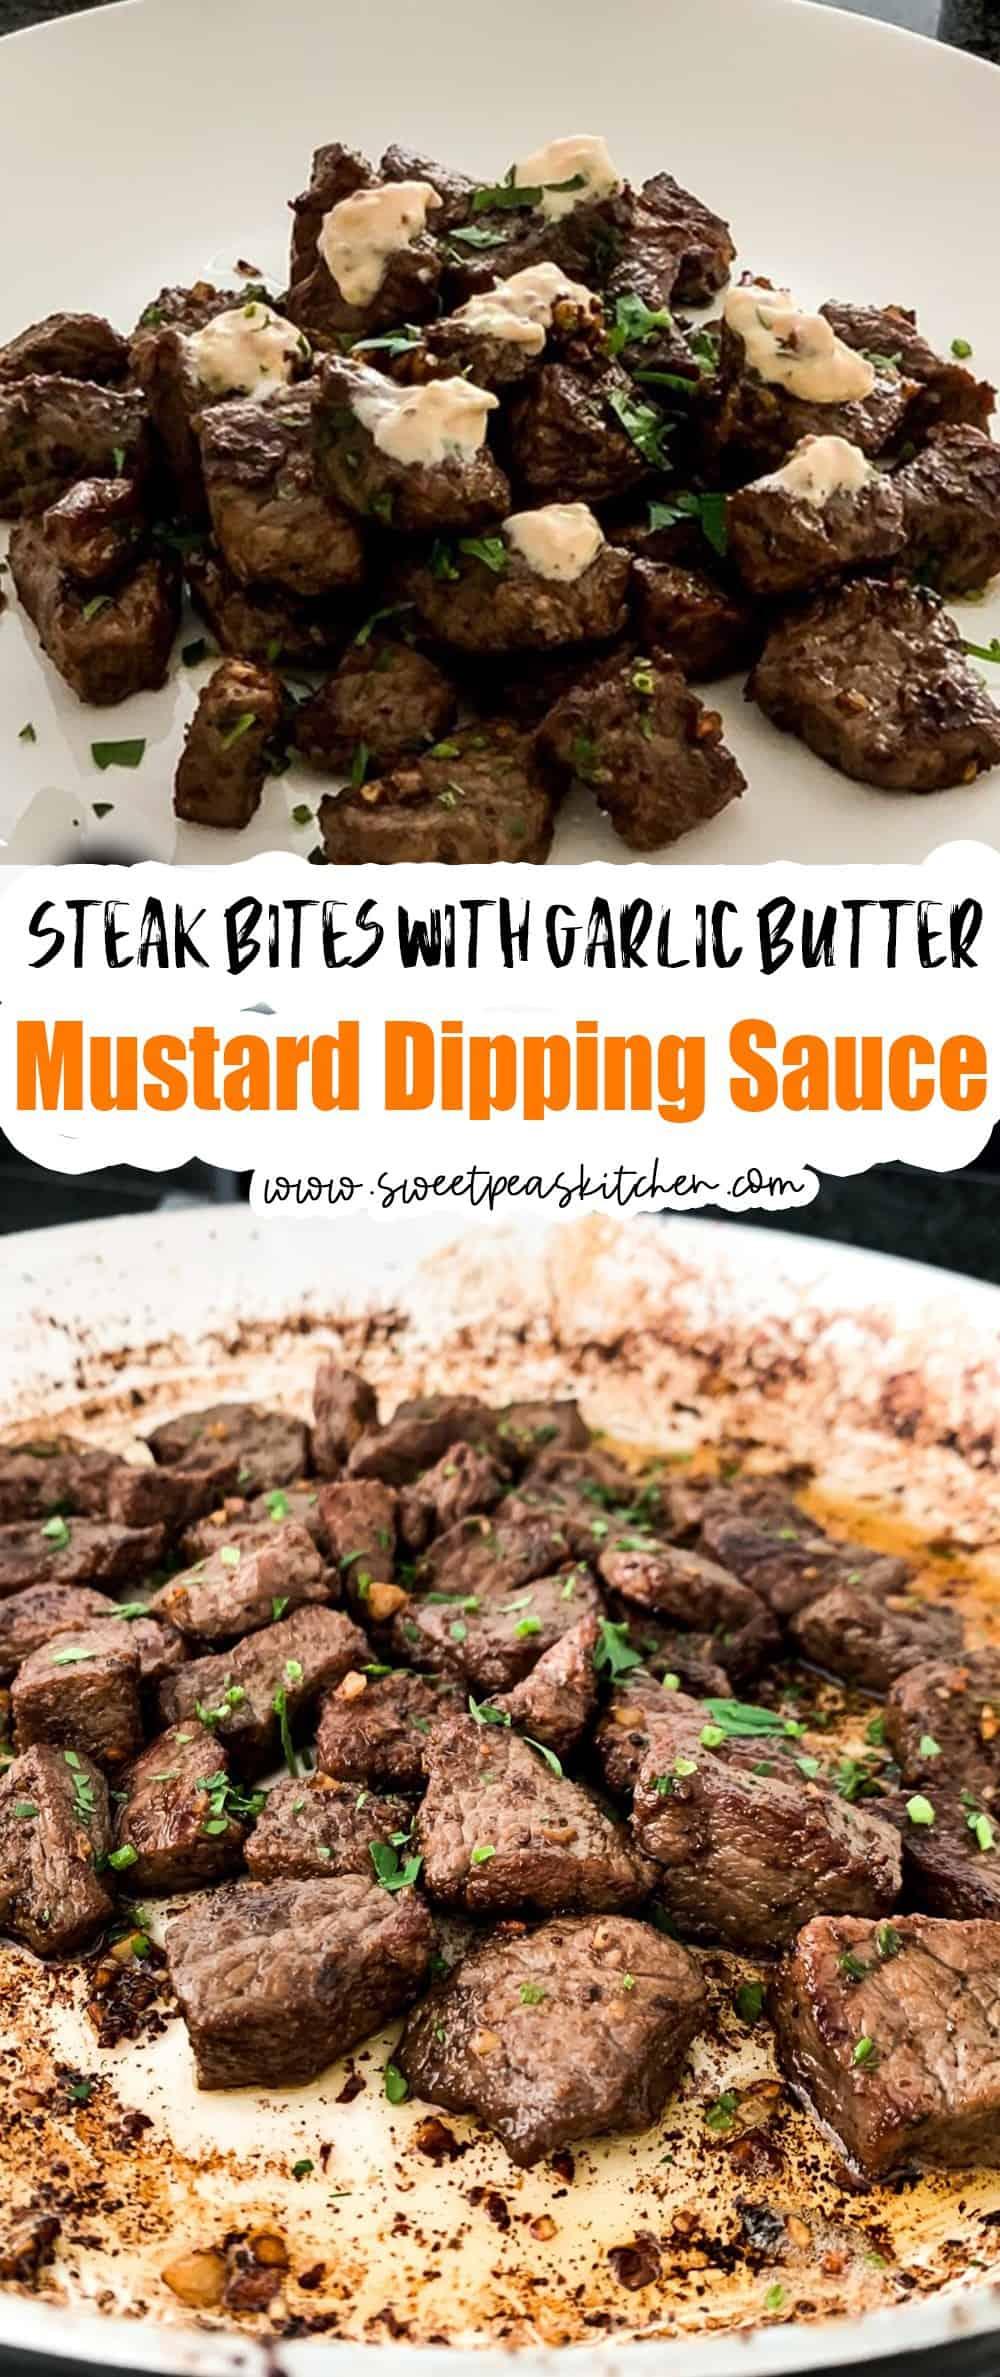 Steak Bites With Garlic Butter & Mustard Dipping Sauce